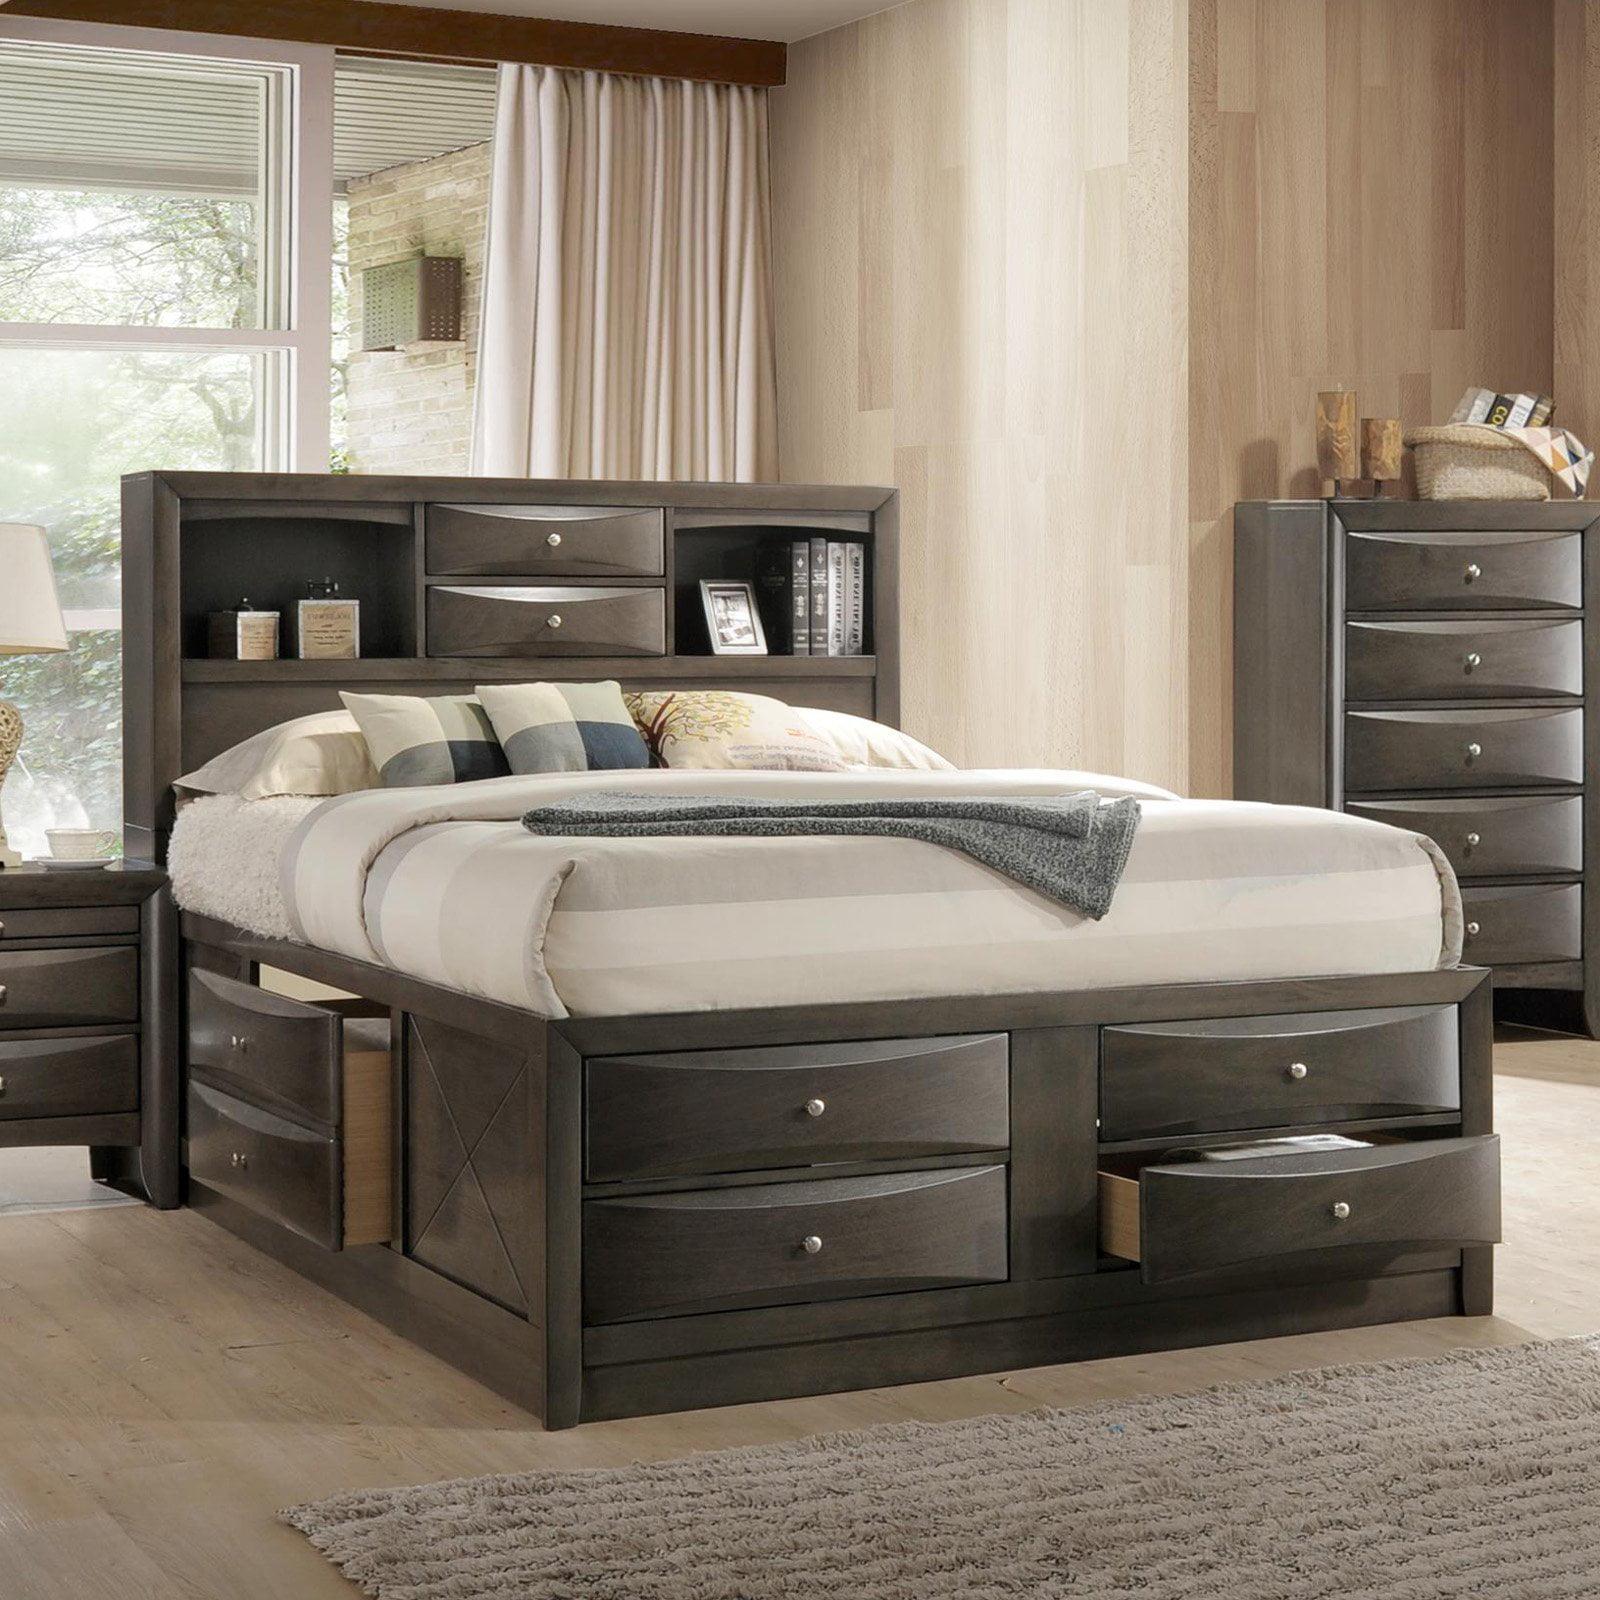 Acme ireland queen bed with storage in black rubberwood multiple sizes walmart com